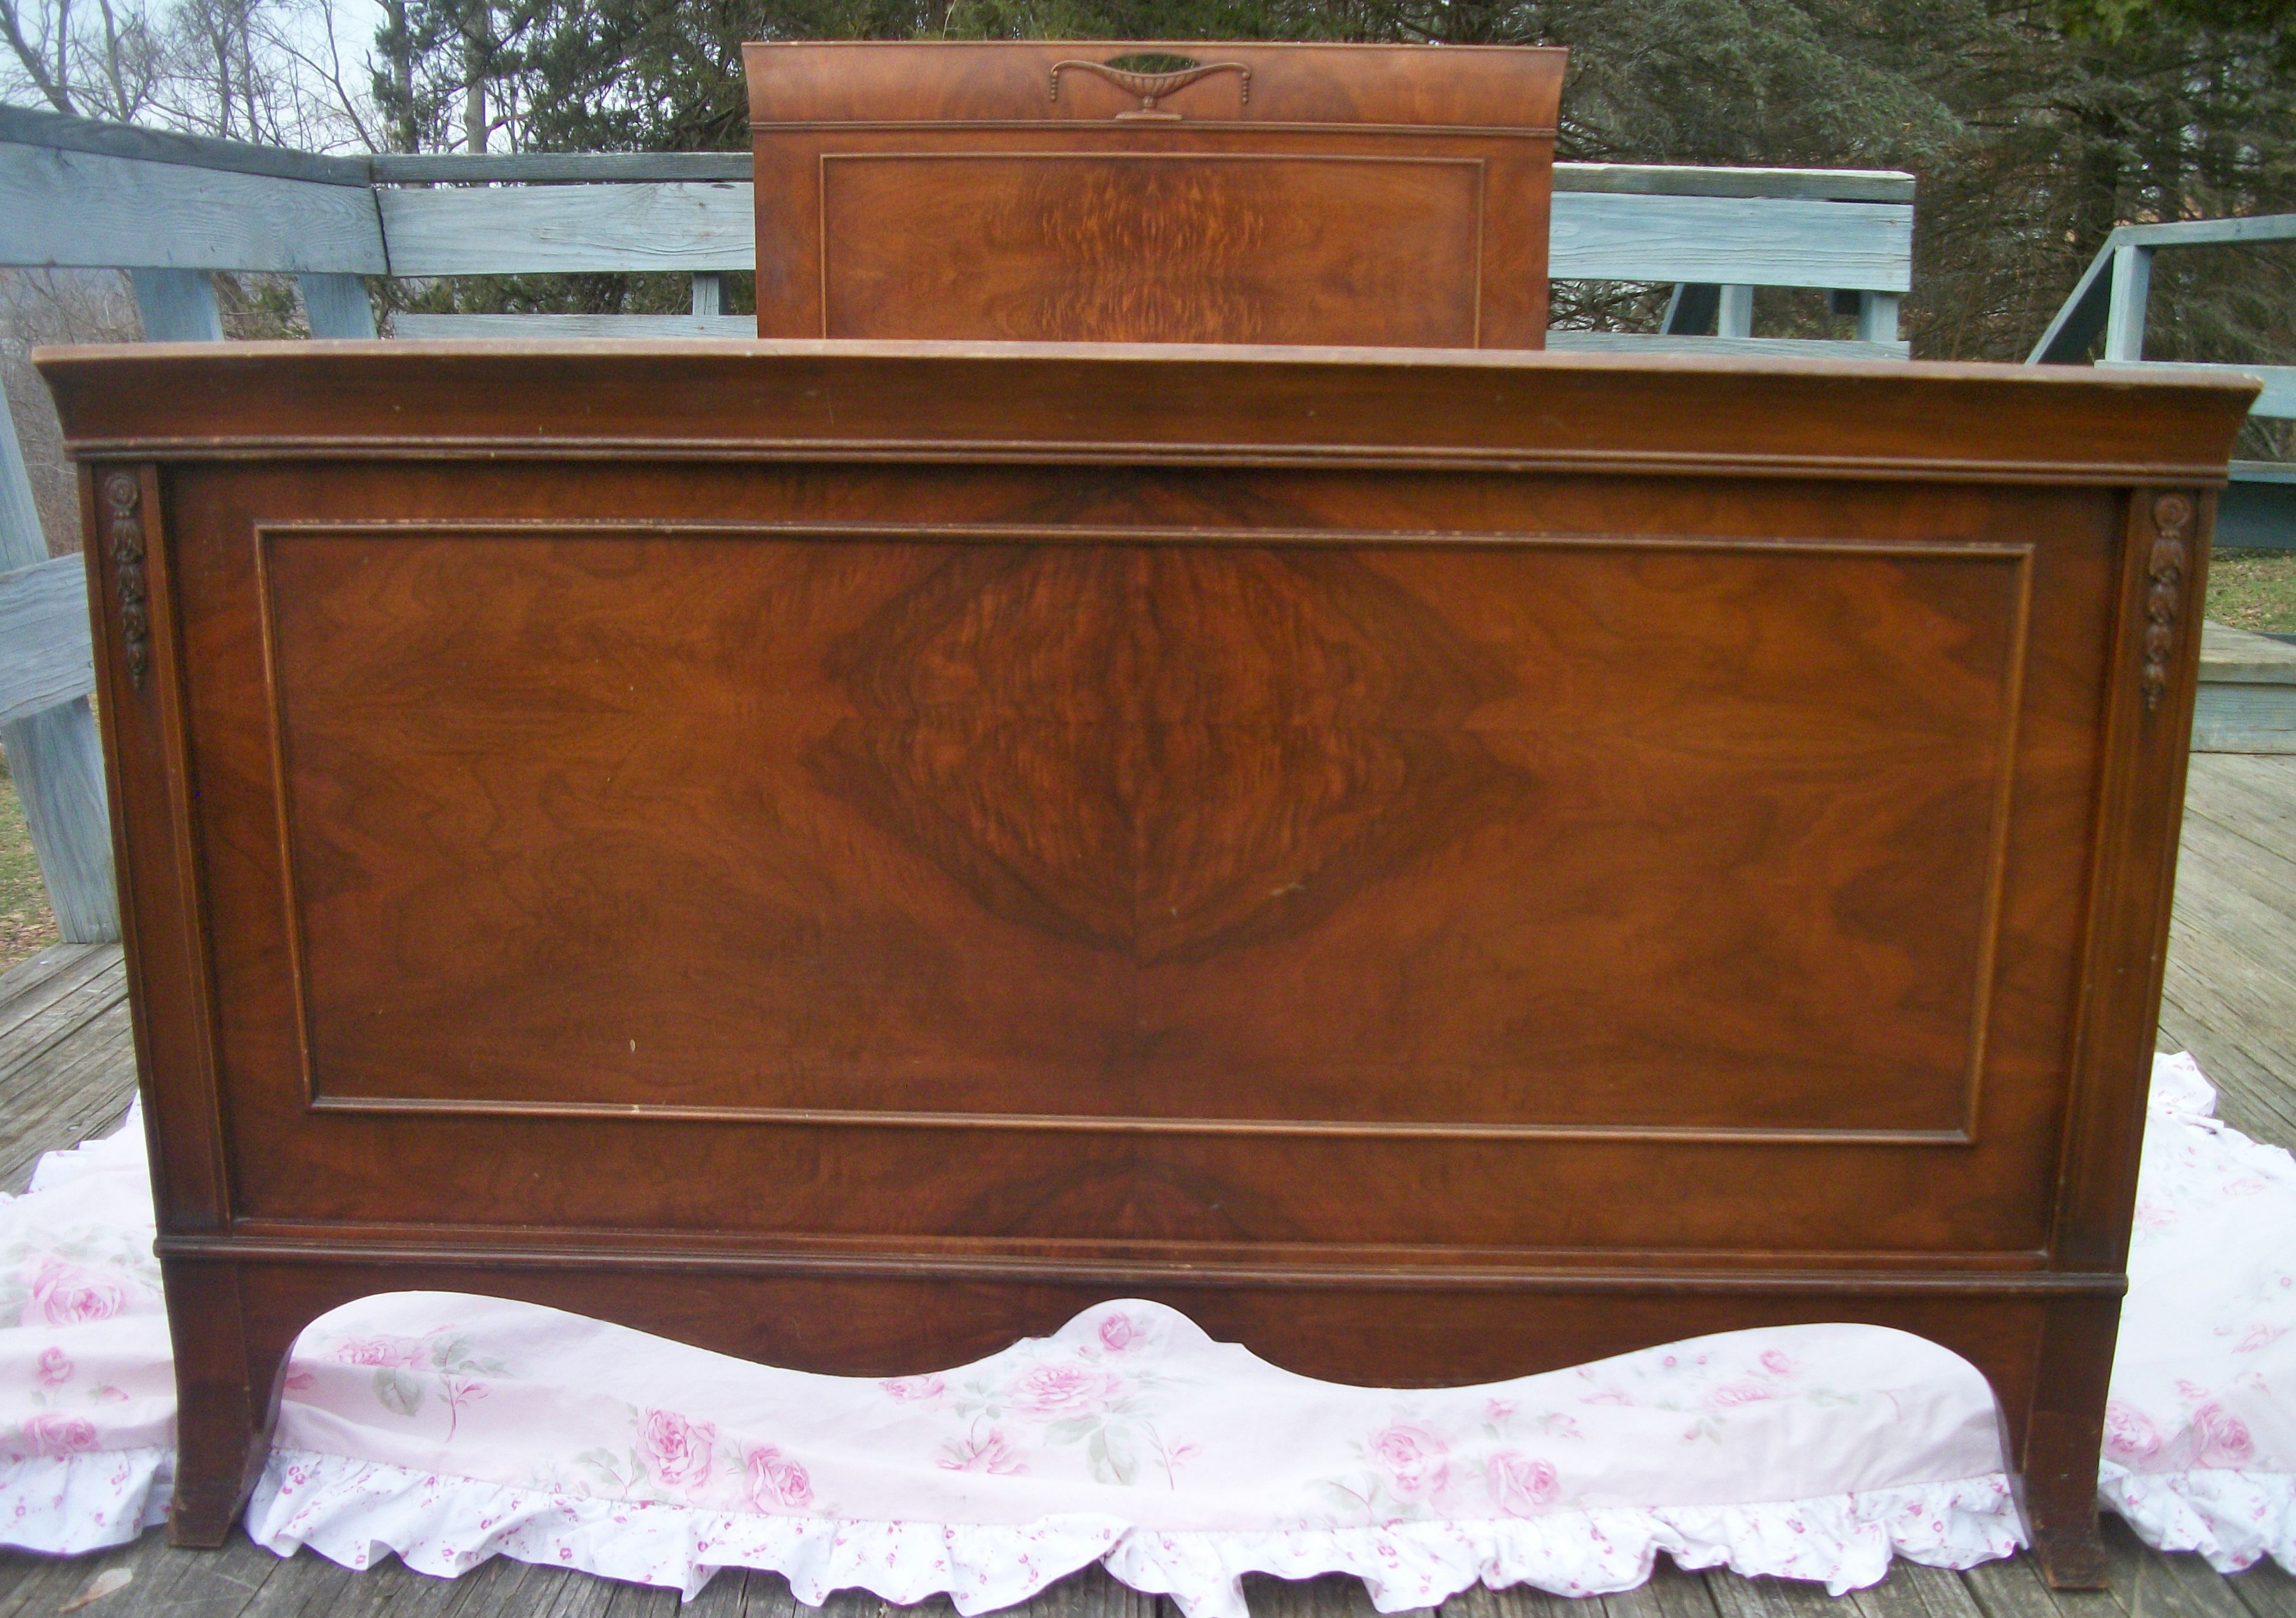 ornate bedroom furniture. gorgeous wood ornate antique bed frame head board foot \u0026 slats. shabby french bedroom furniture